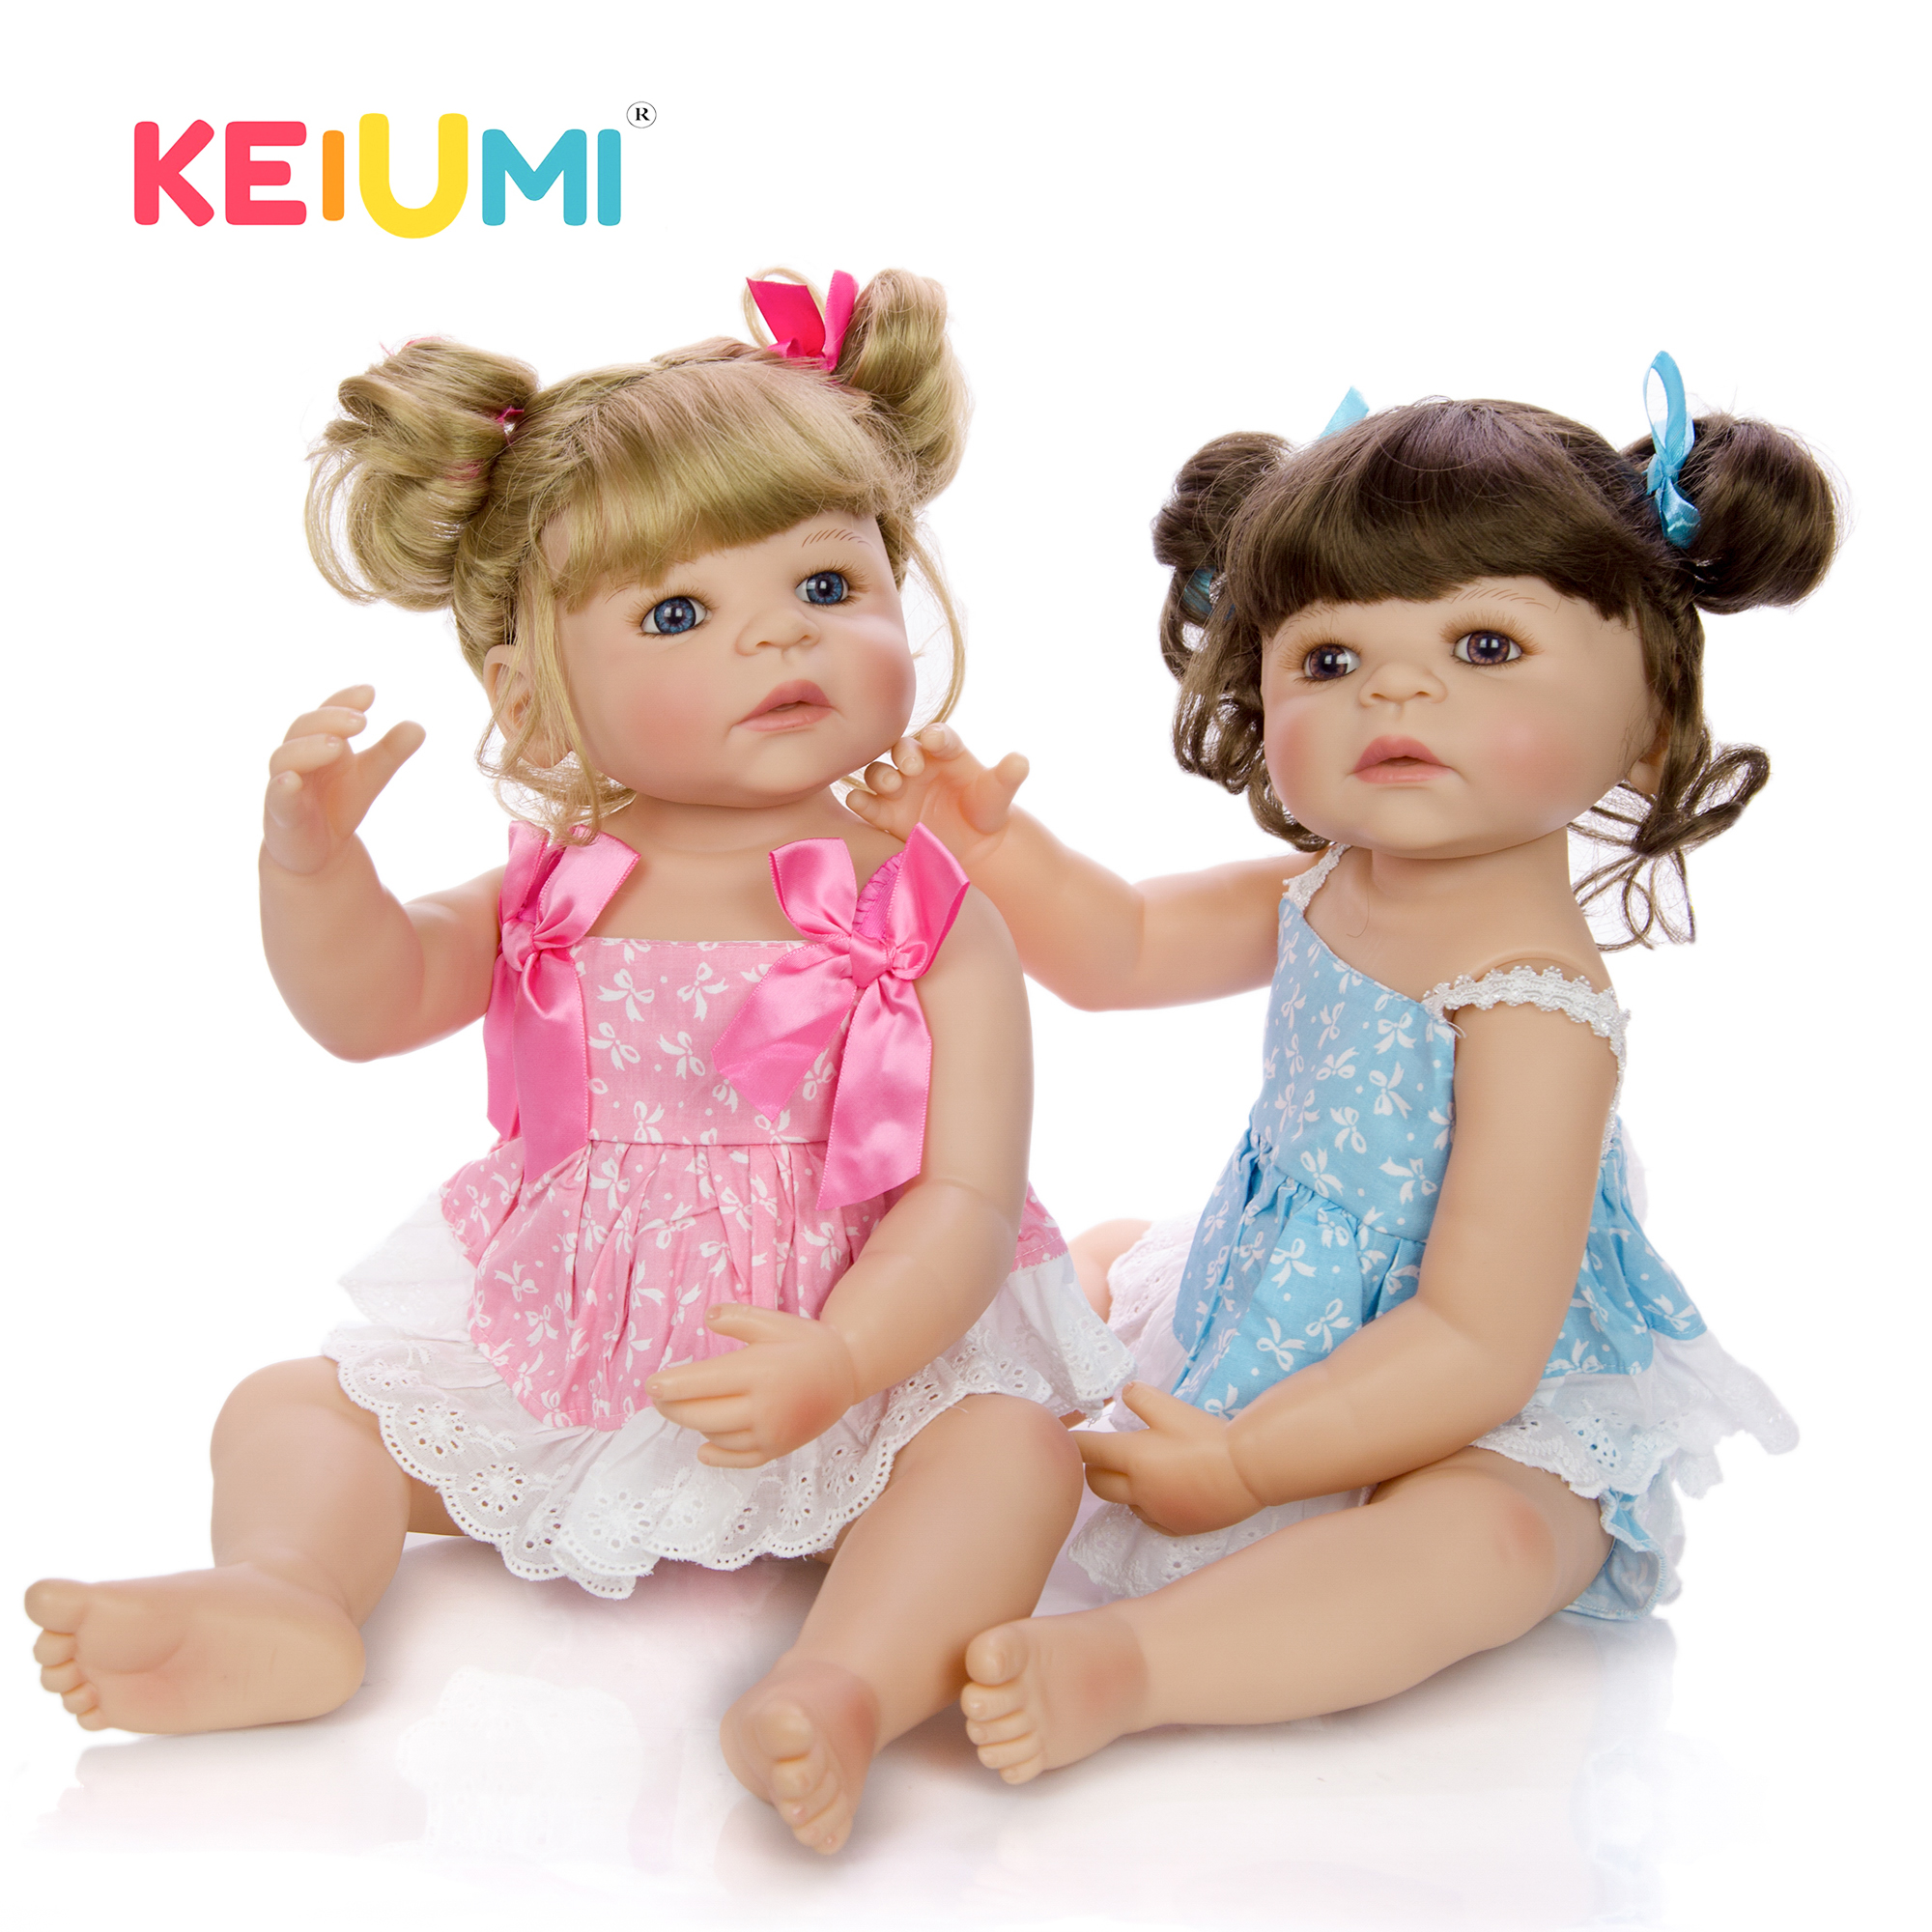 Lifelike 22 Inch Princess Twins Reborn Babies Girl Dolls For kids Playmates 55 cm KEIUMI Newborn